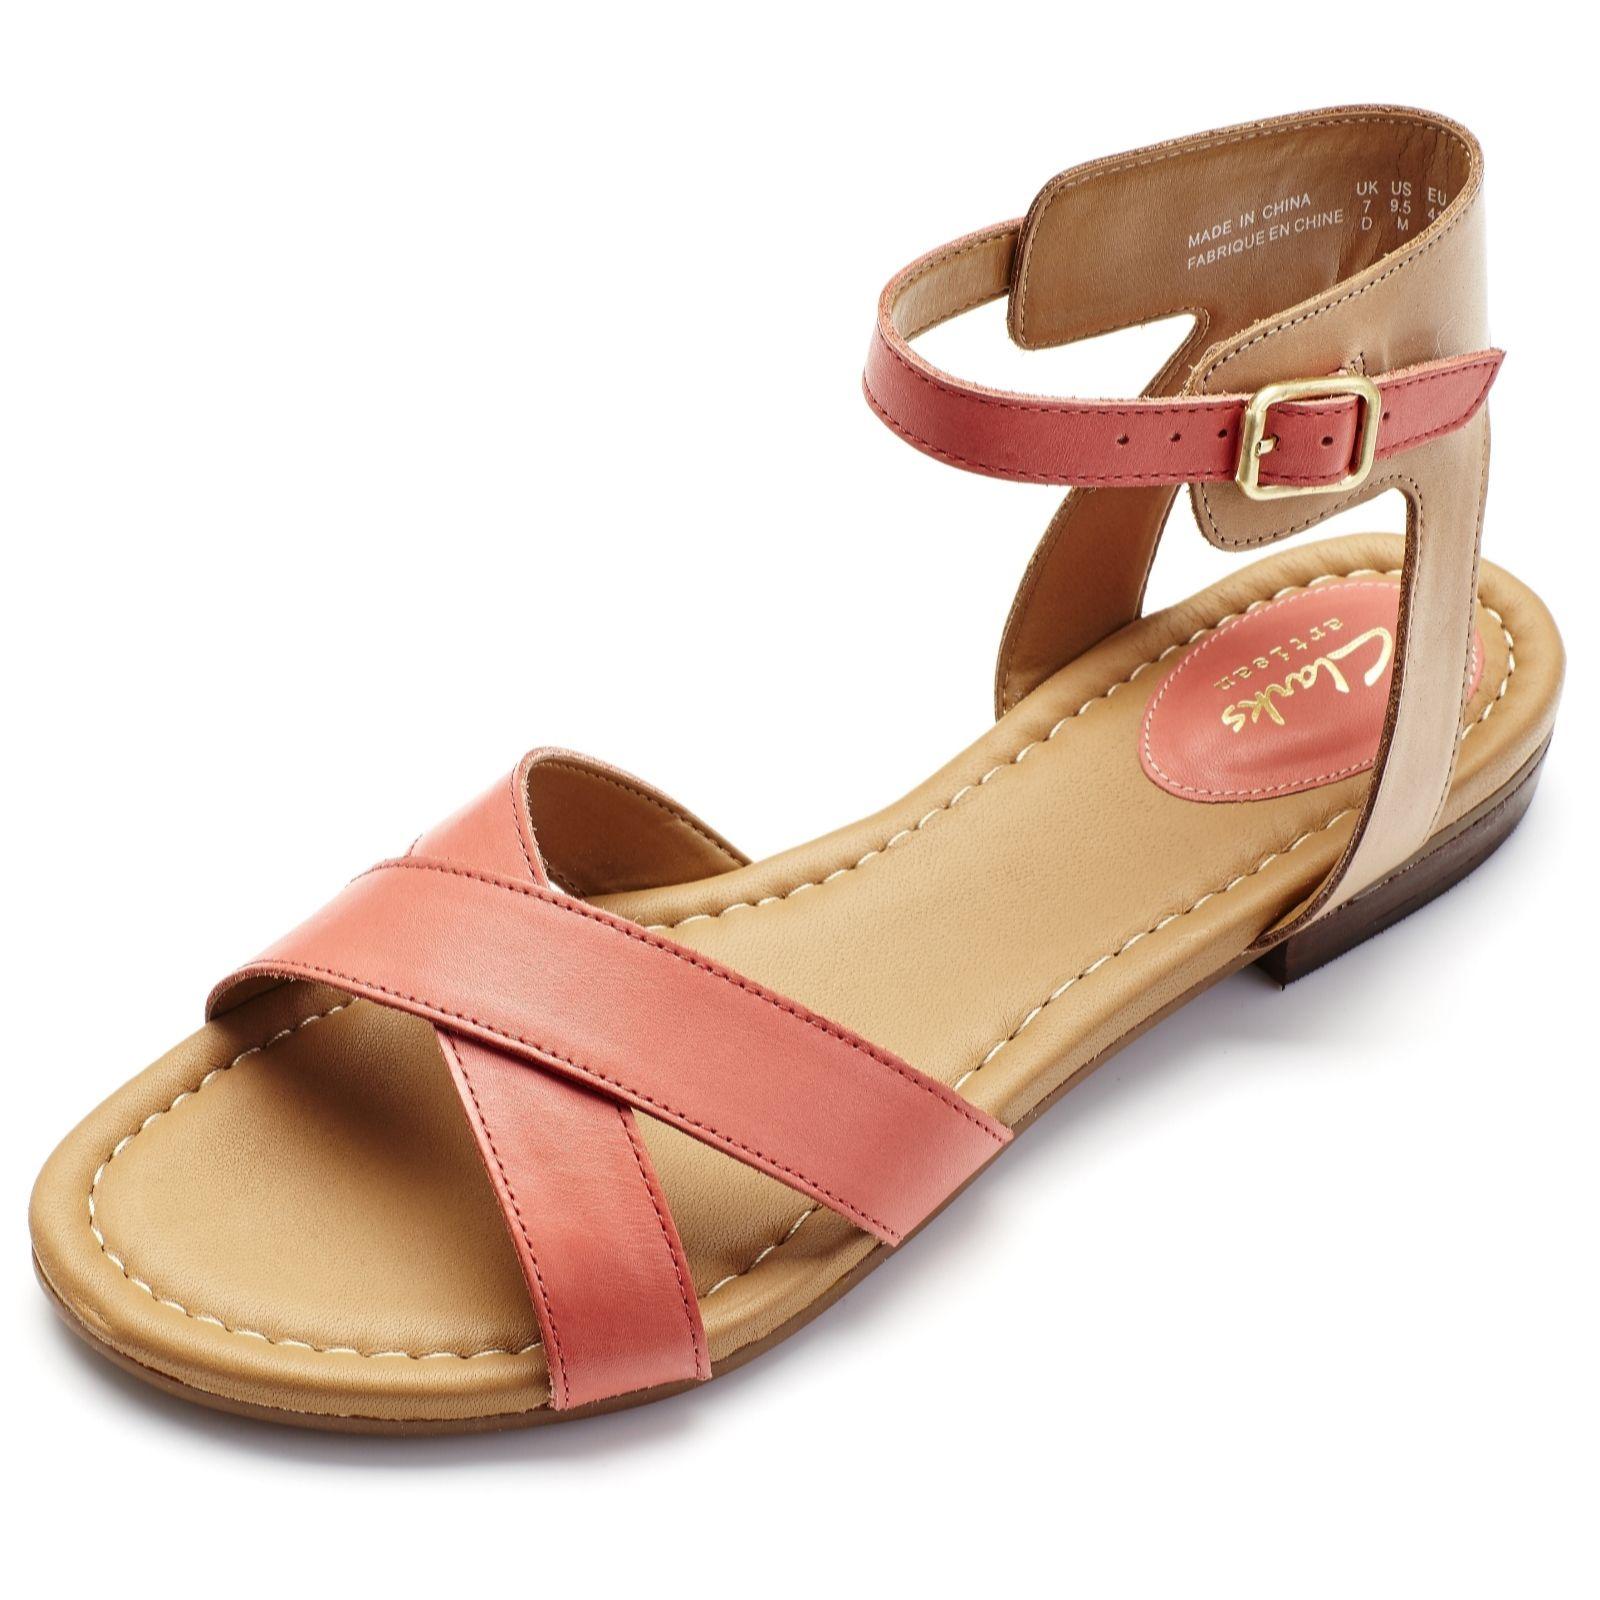 Wide fit sandals shoes uk - Wide Fit Sandals Shoes Uk 46